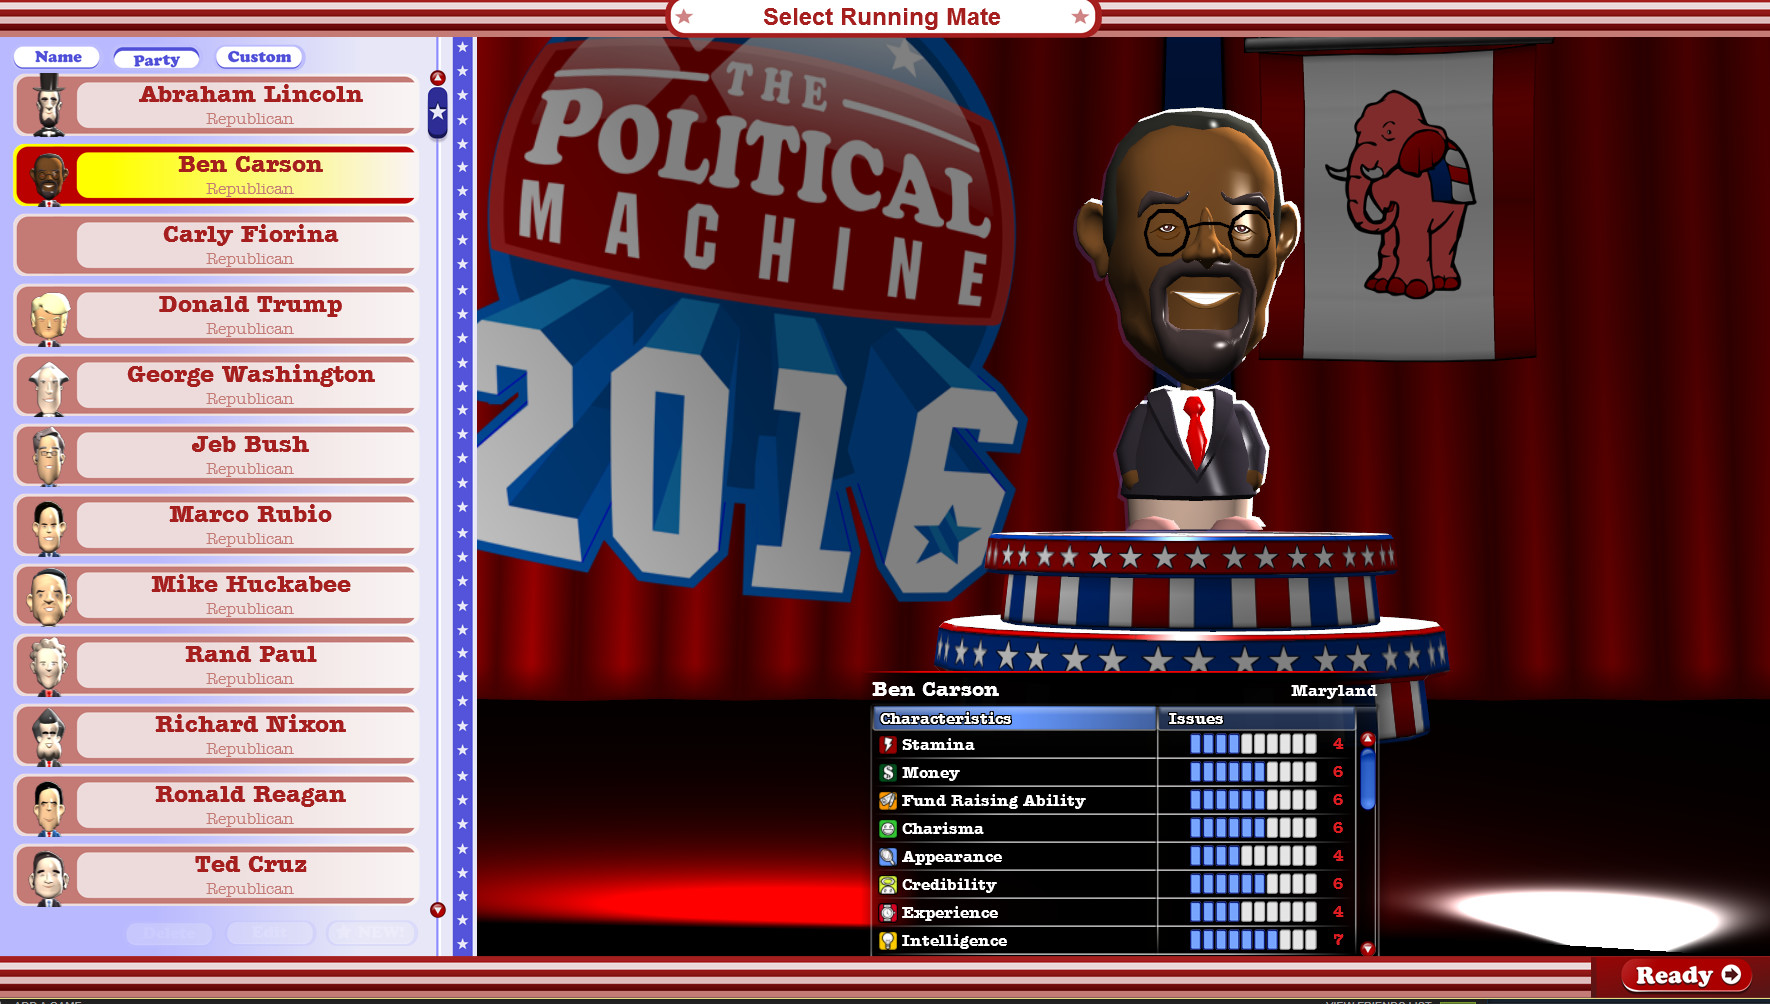 The Political Machine 2016 Review Screenshot 2